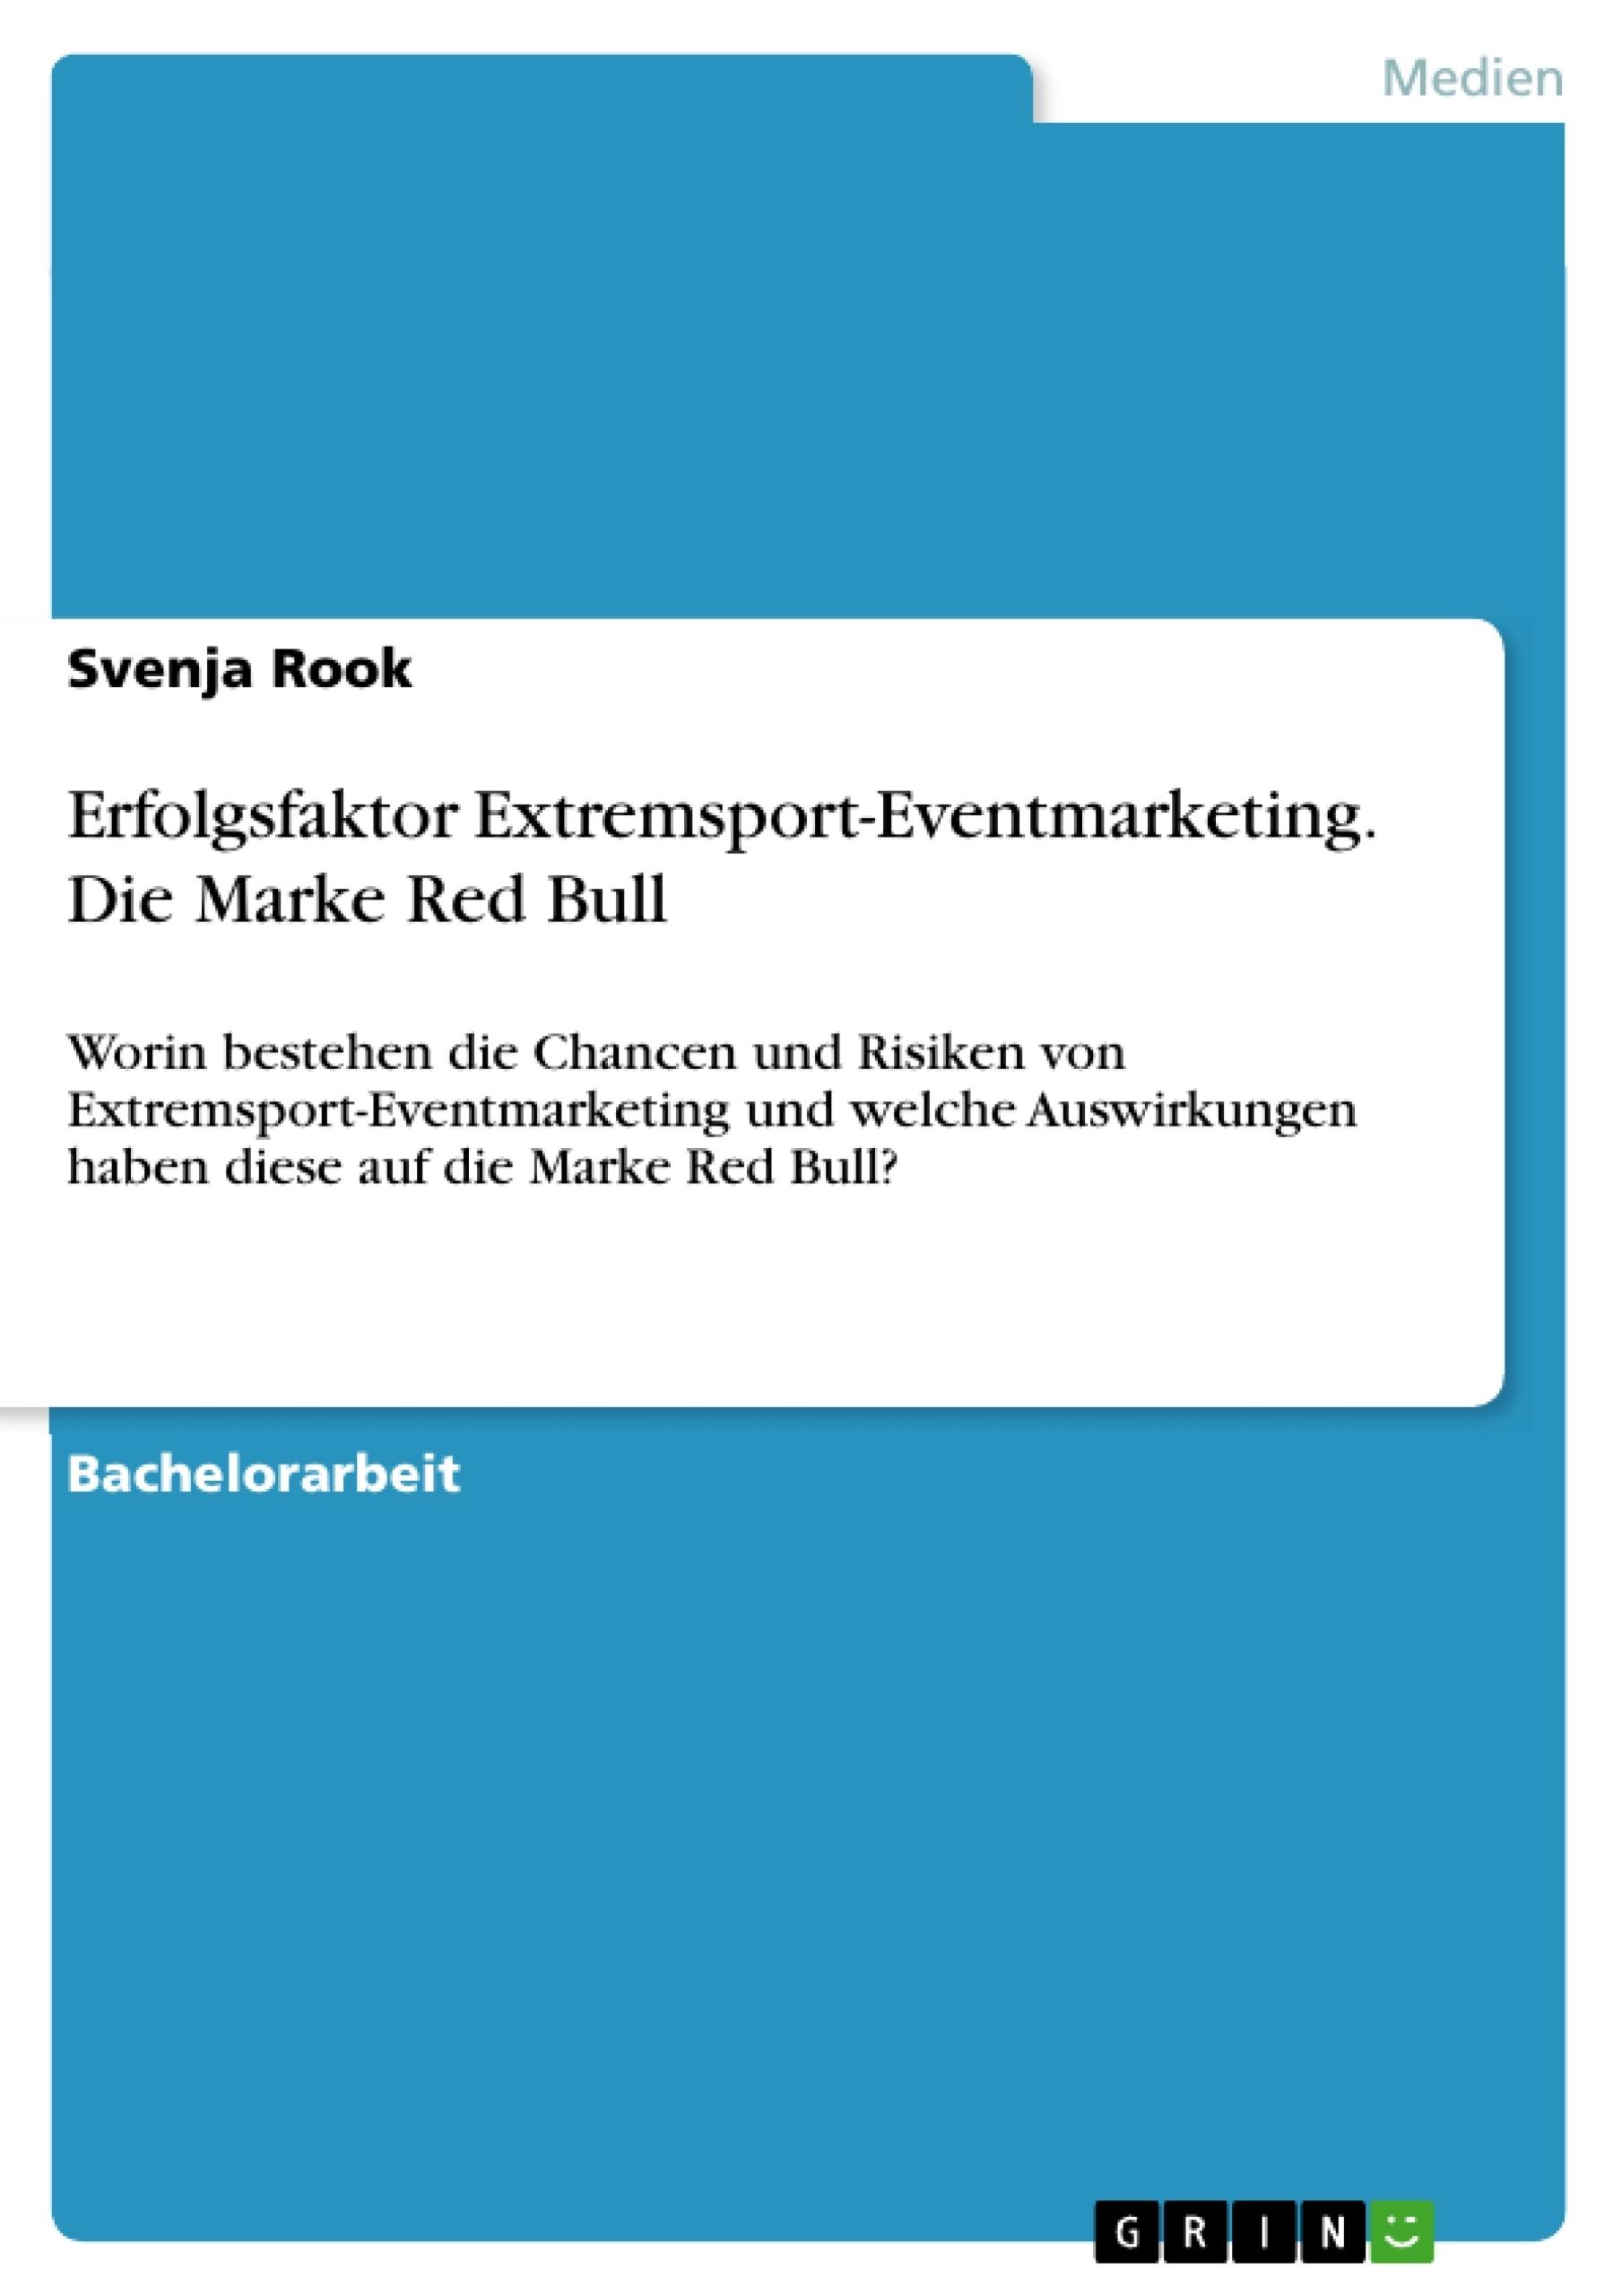 Titel: Erfolgsfaktor Extremsport-Eventmarketing. Die Marke Red Bull